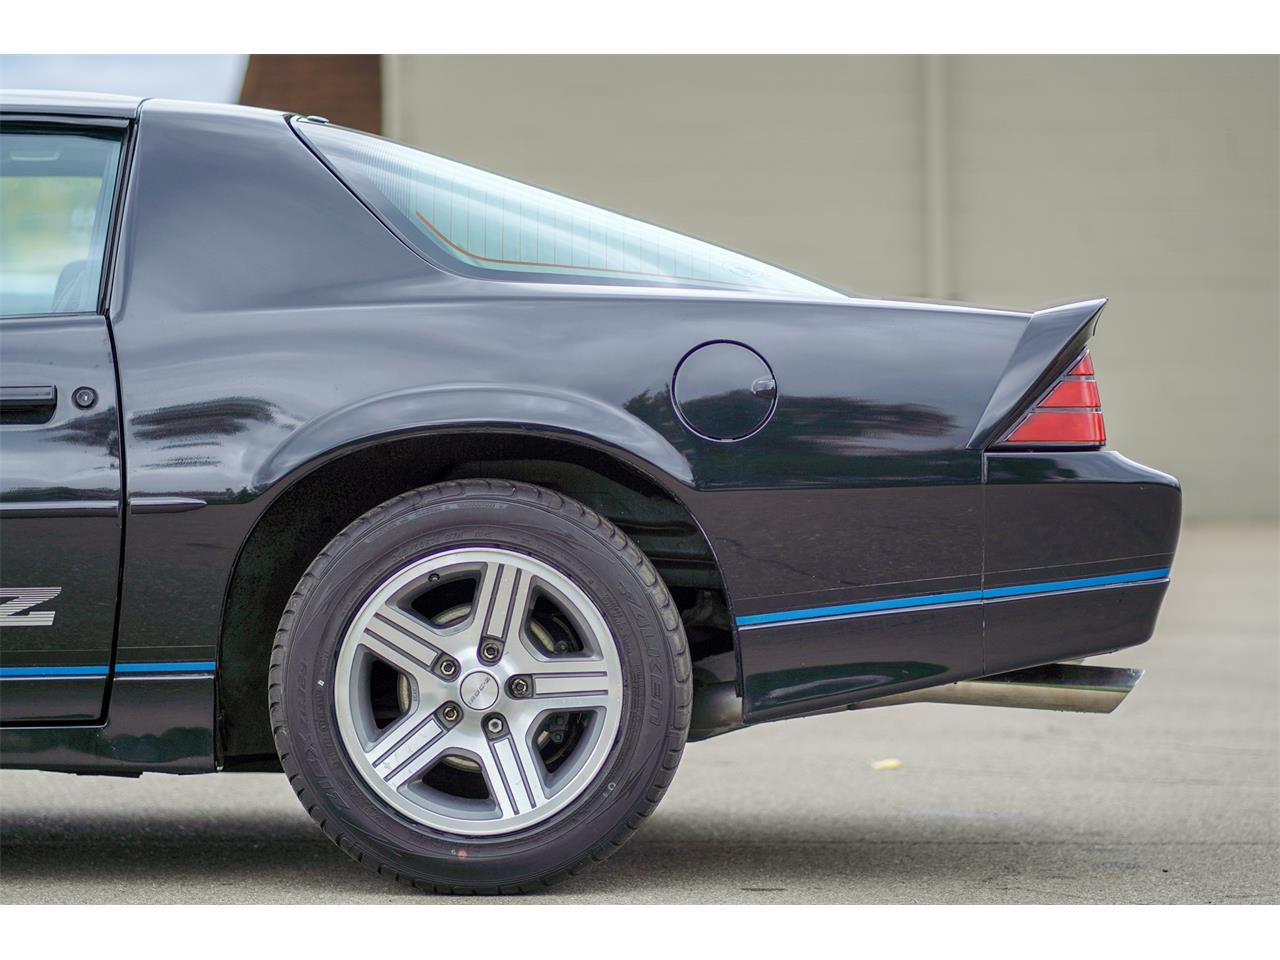 1988 Chevrolet Camaro IROC Z28 (CC-1414695) for sale in Milford, Michigan